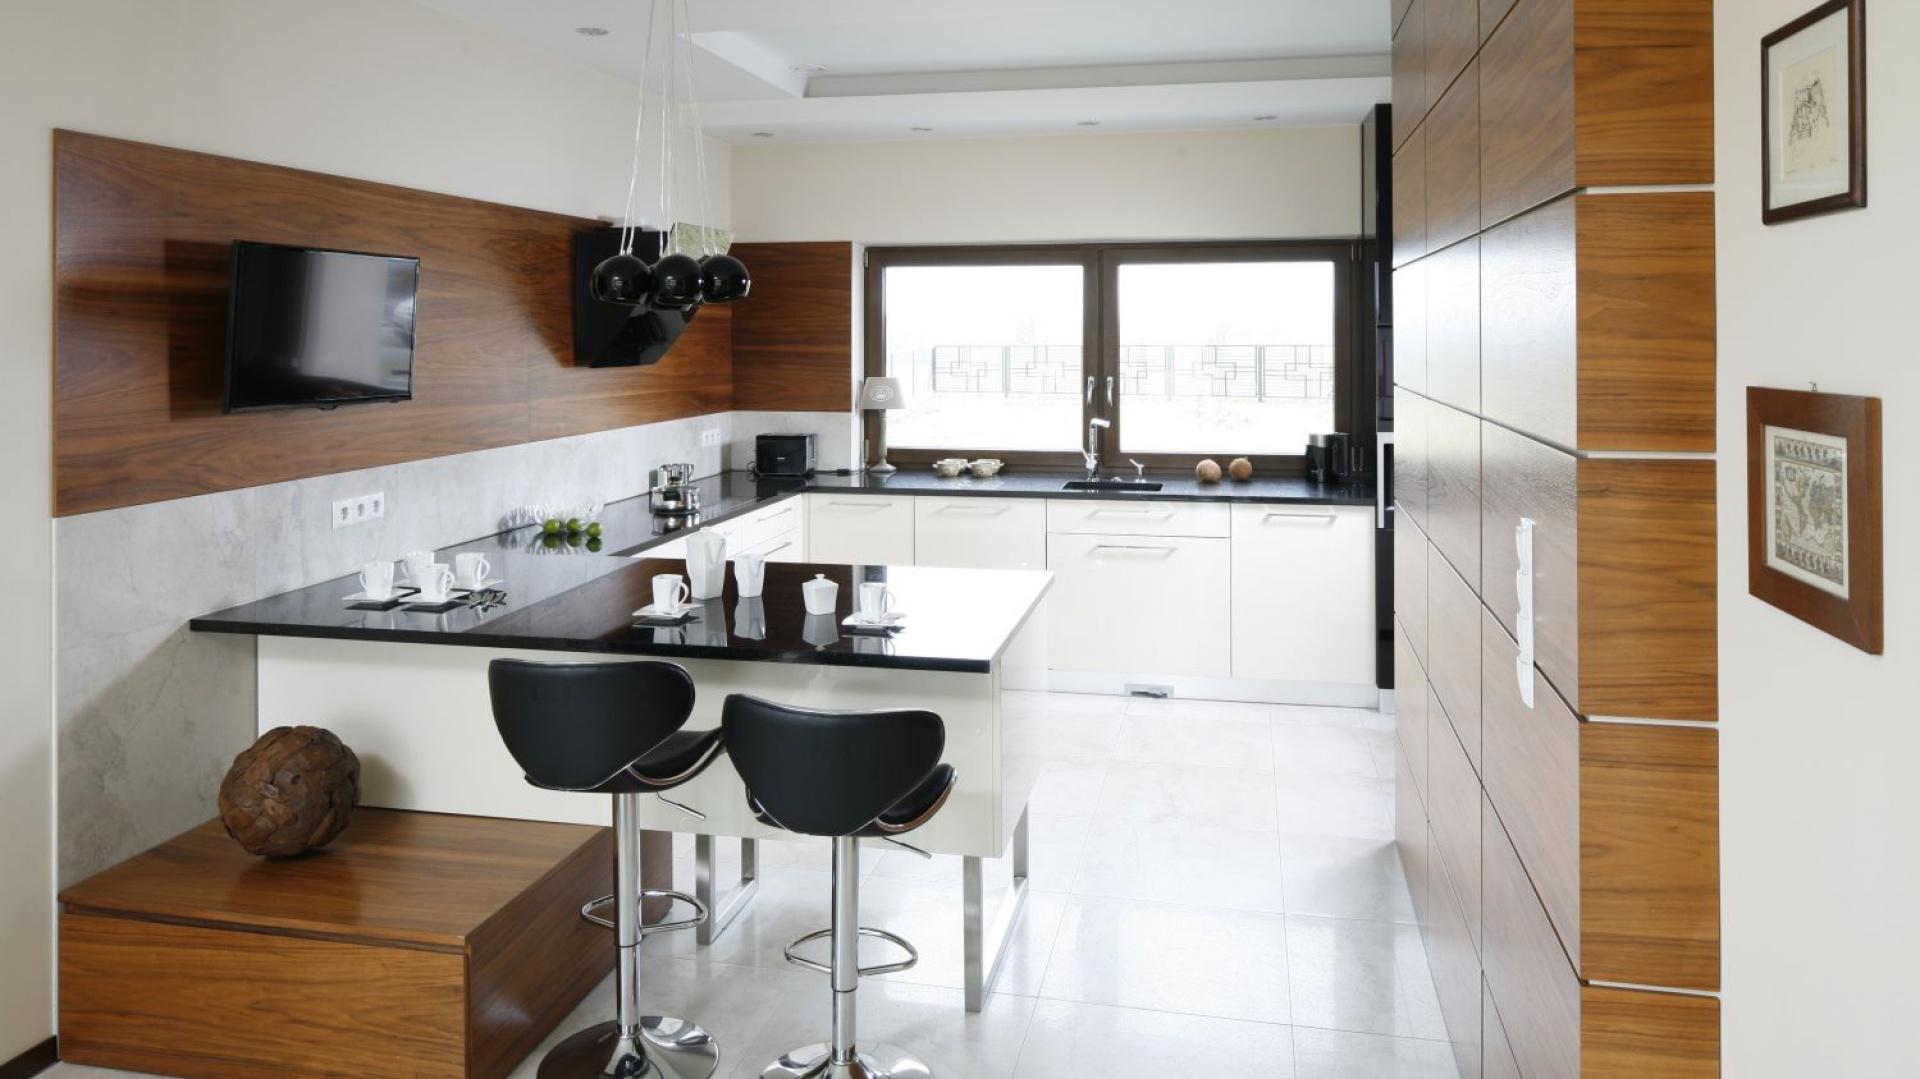 Kuchnia z półwyspem, nad Telewizor w kuchni 10   -> Mala Kuchnia Zdjecia